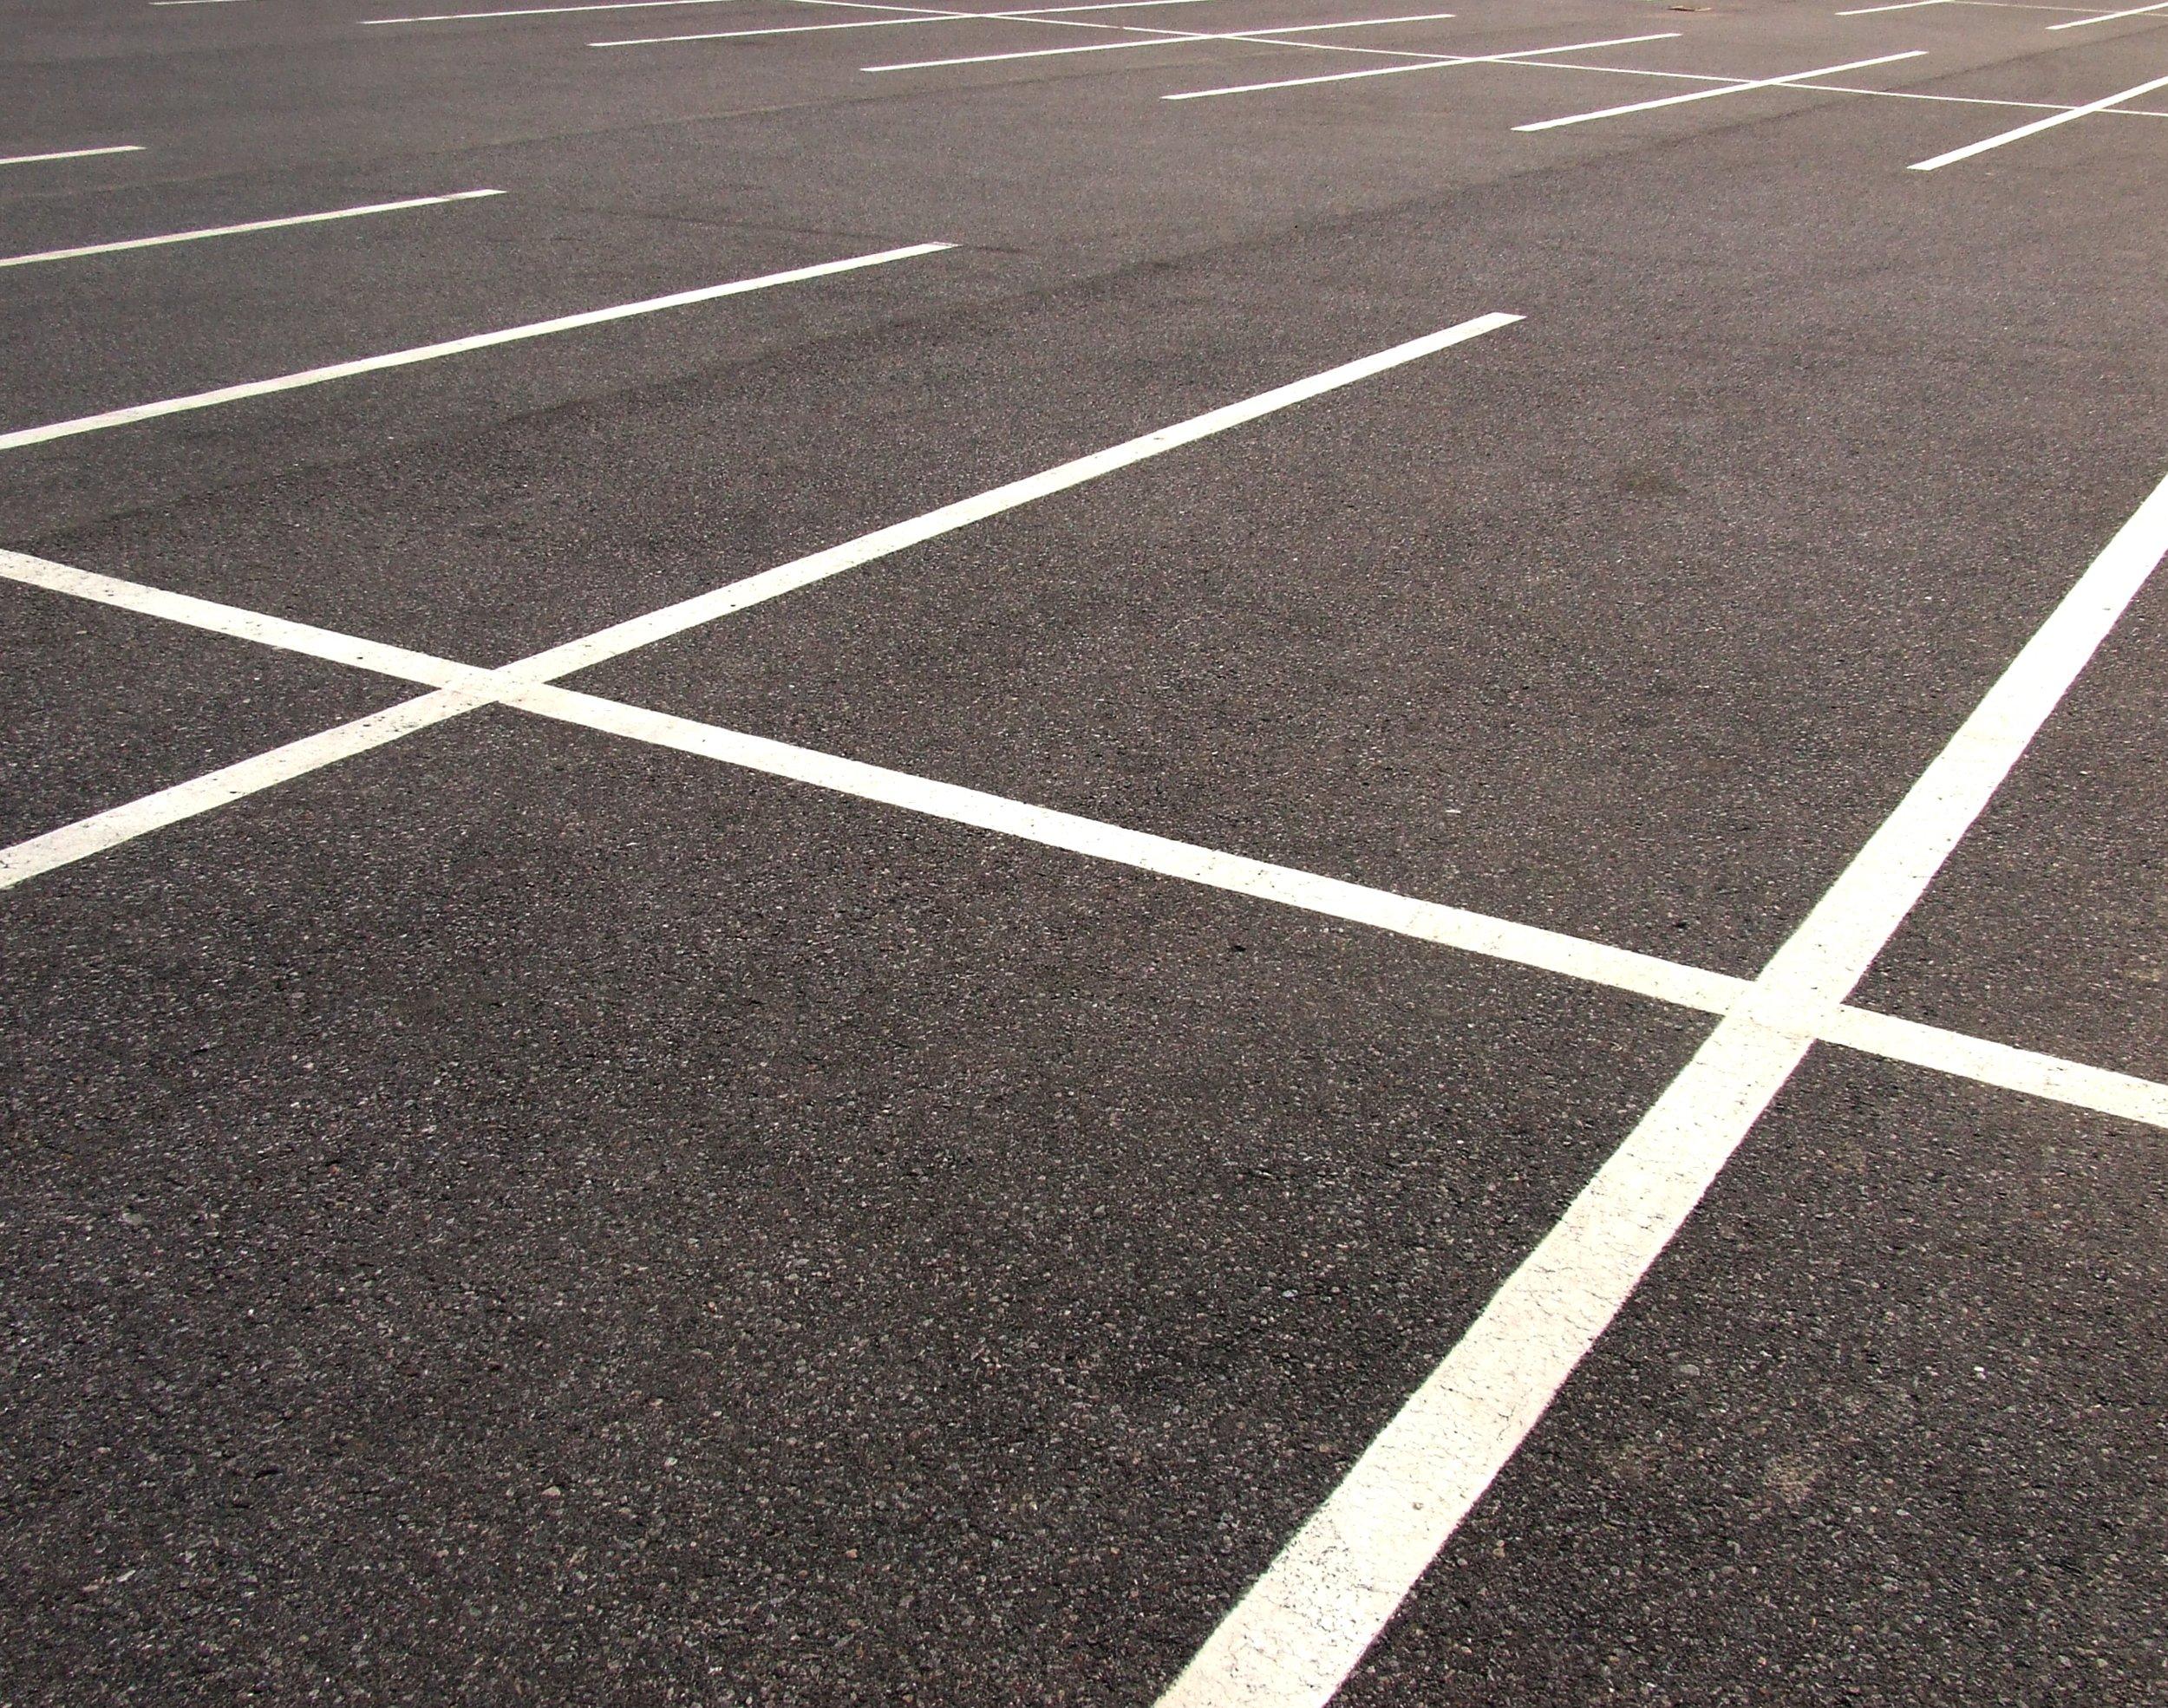 parkinglotpic.jpg